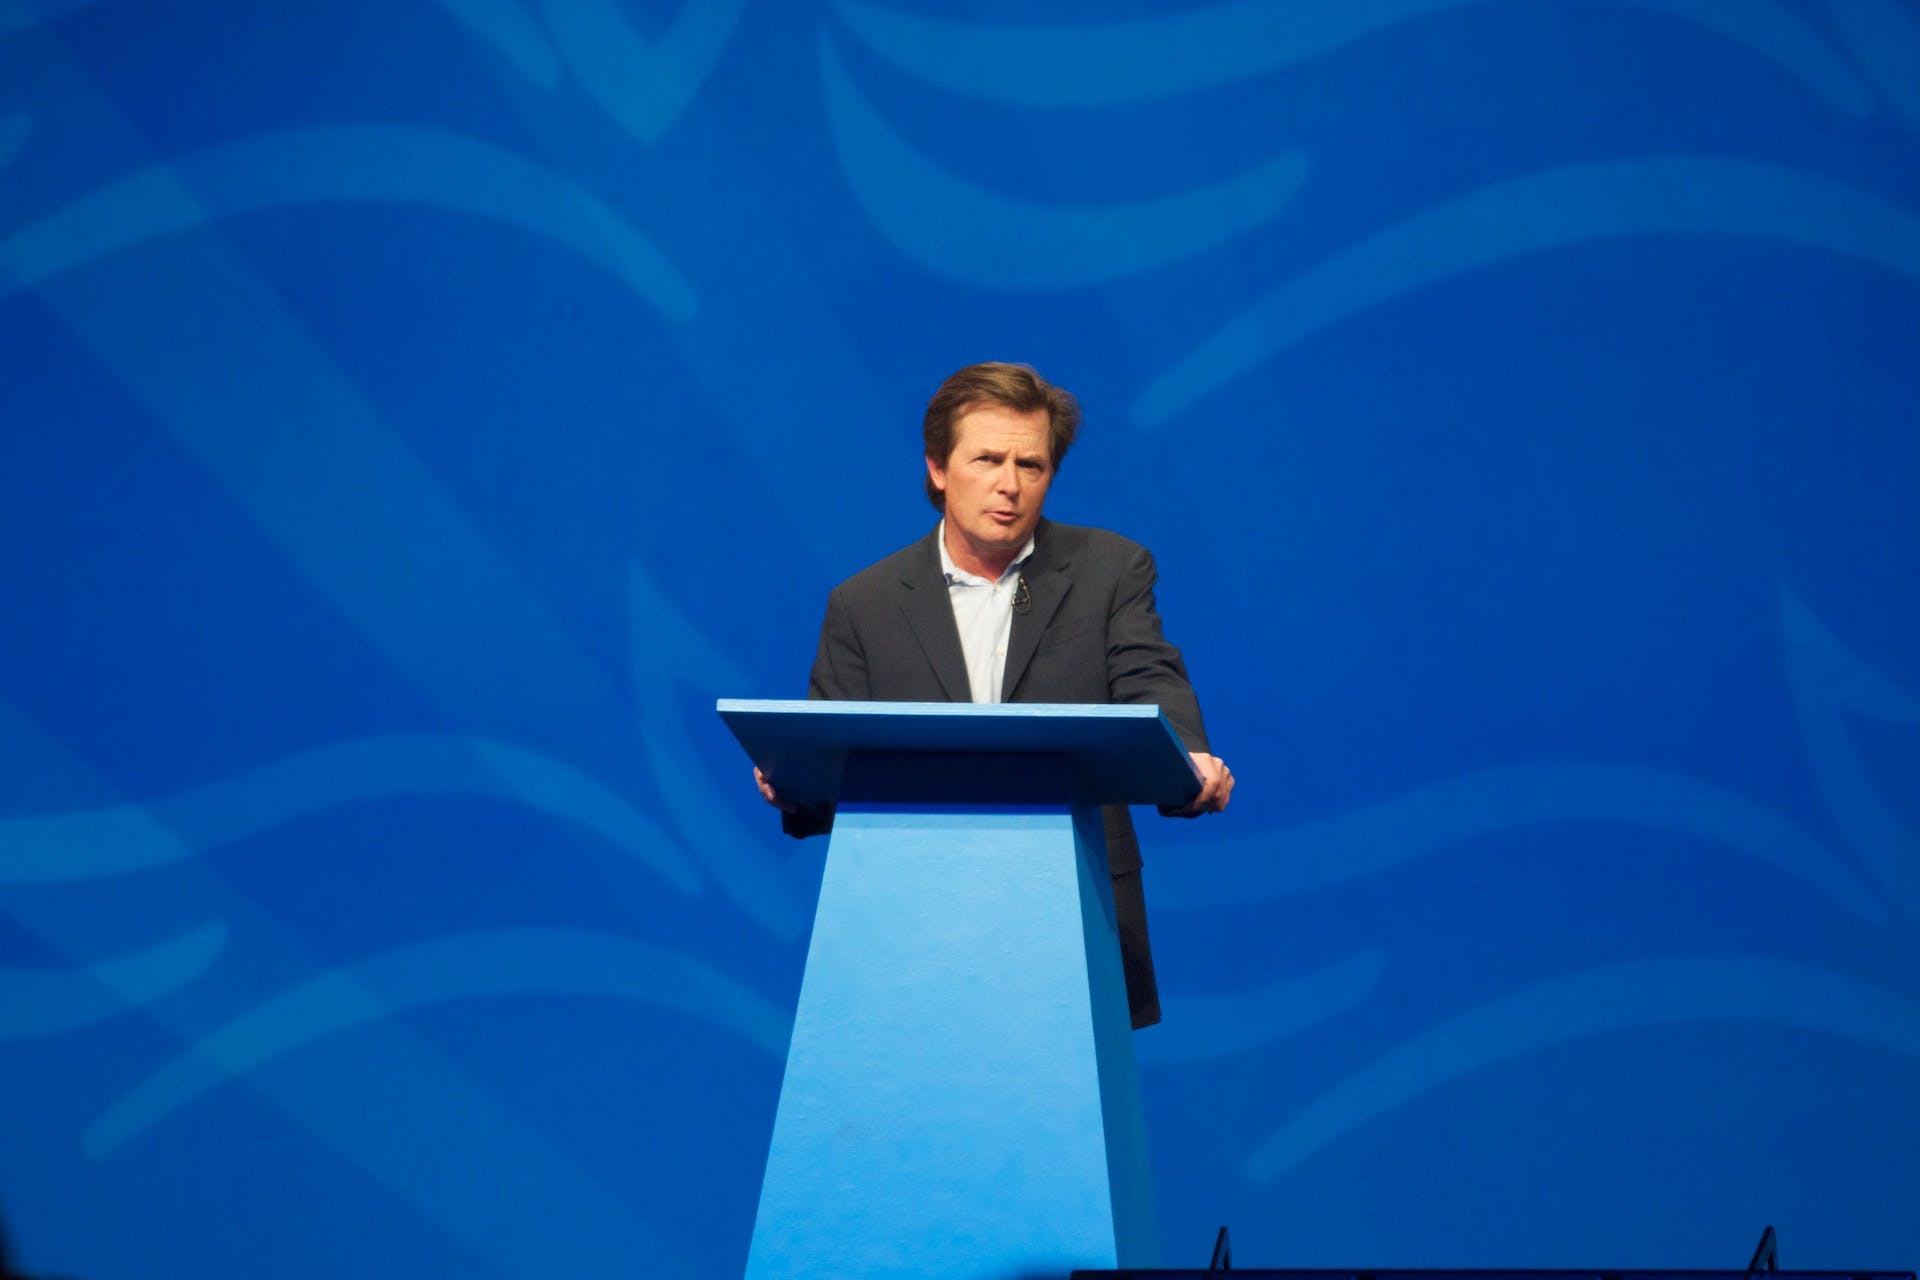 Michael J Fox on stage